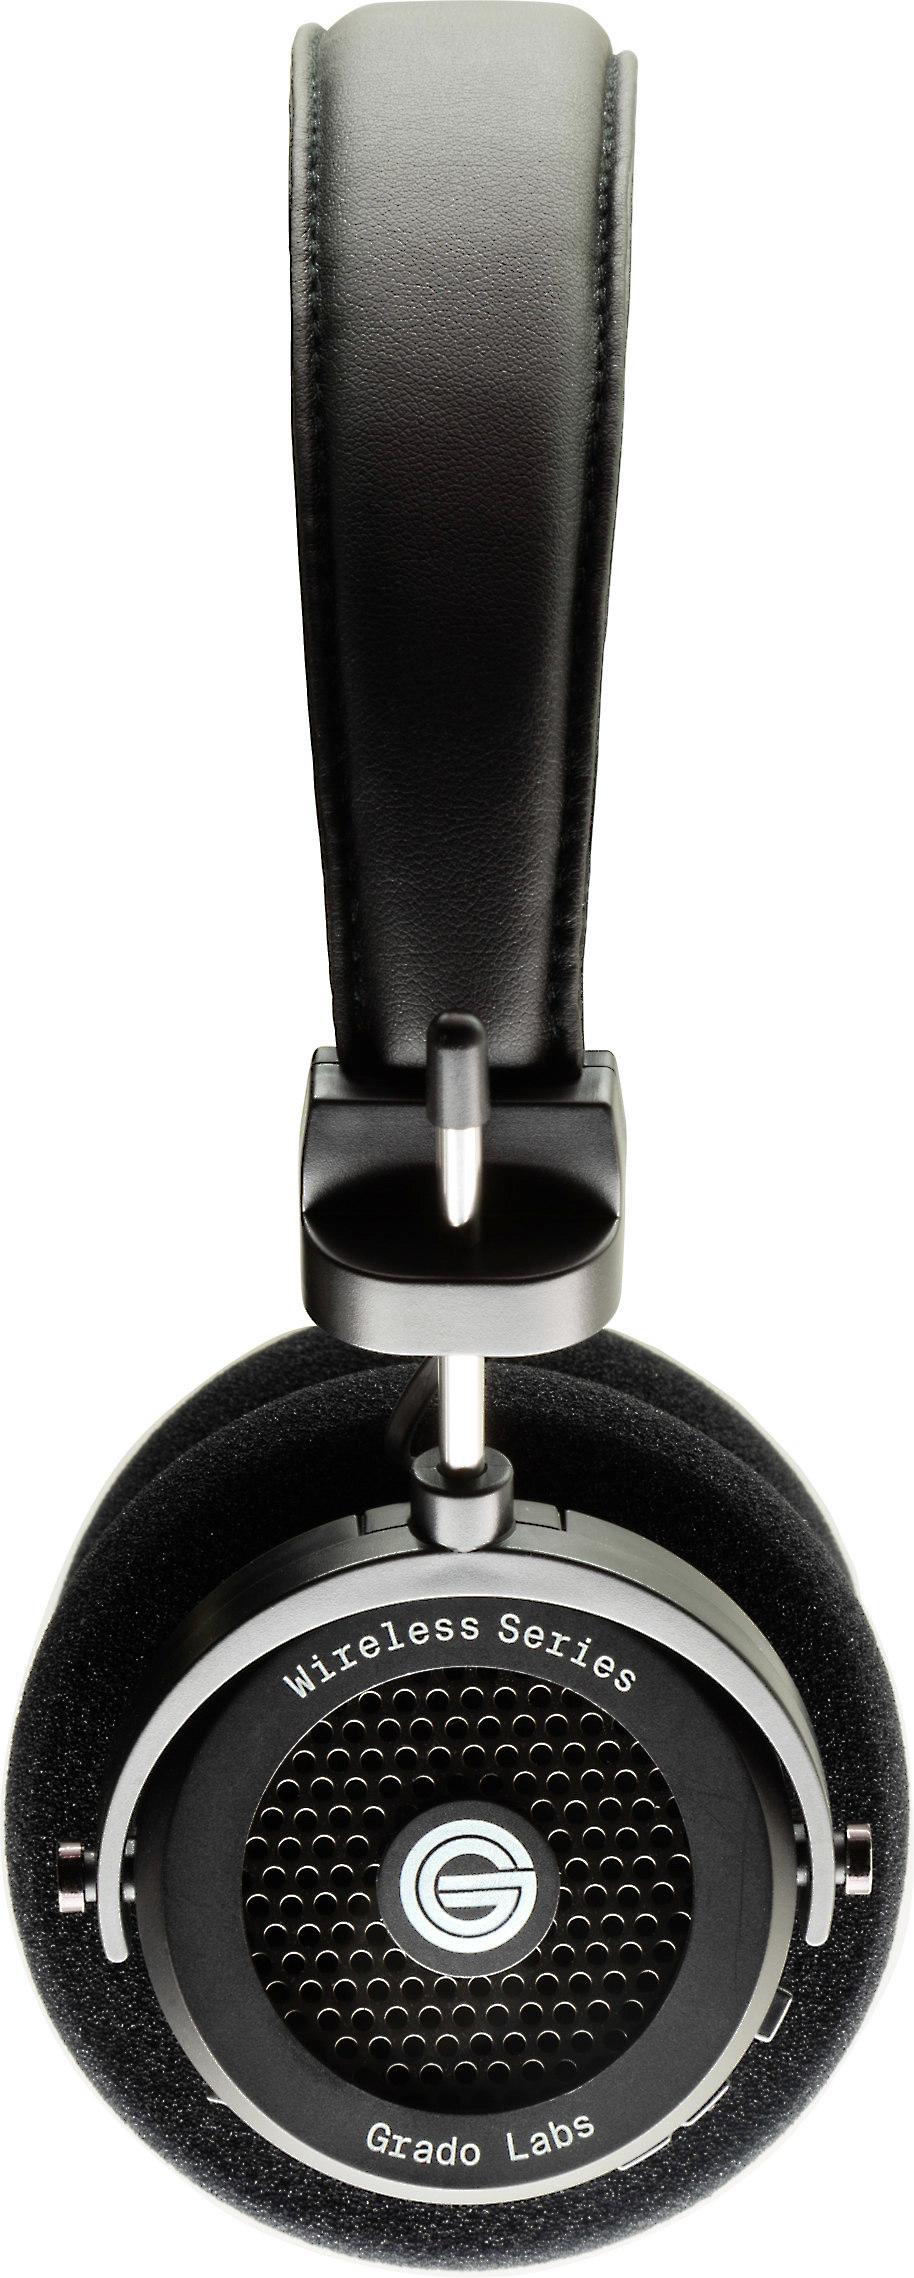 49d18206ca0 Grado GW100 Wireless Series Open-back Bluetooth® headphones at  Crutchfield.com